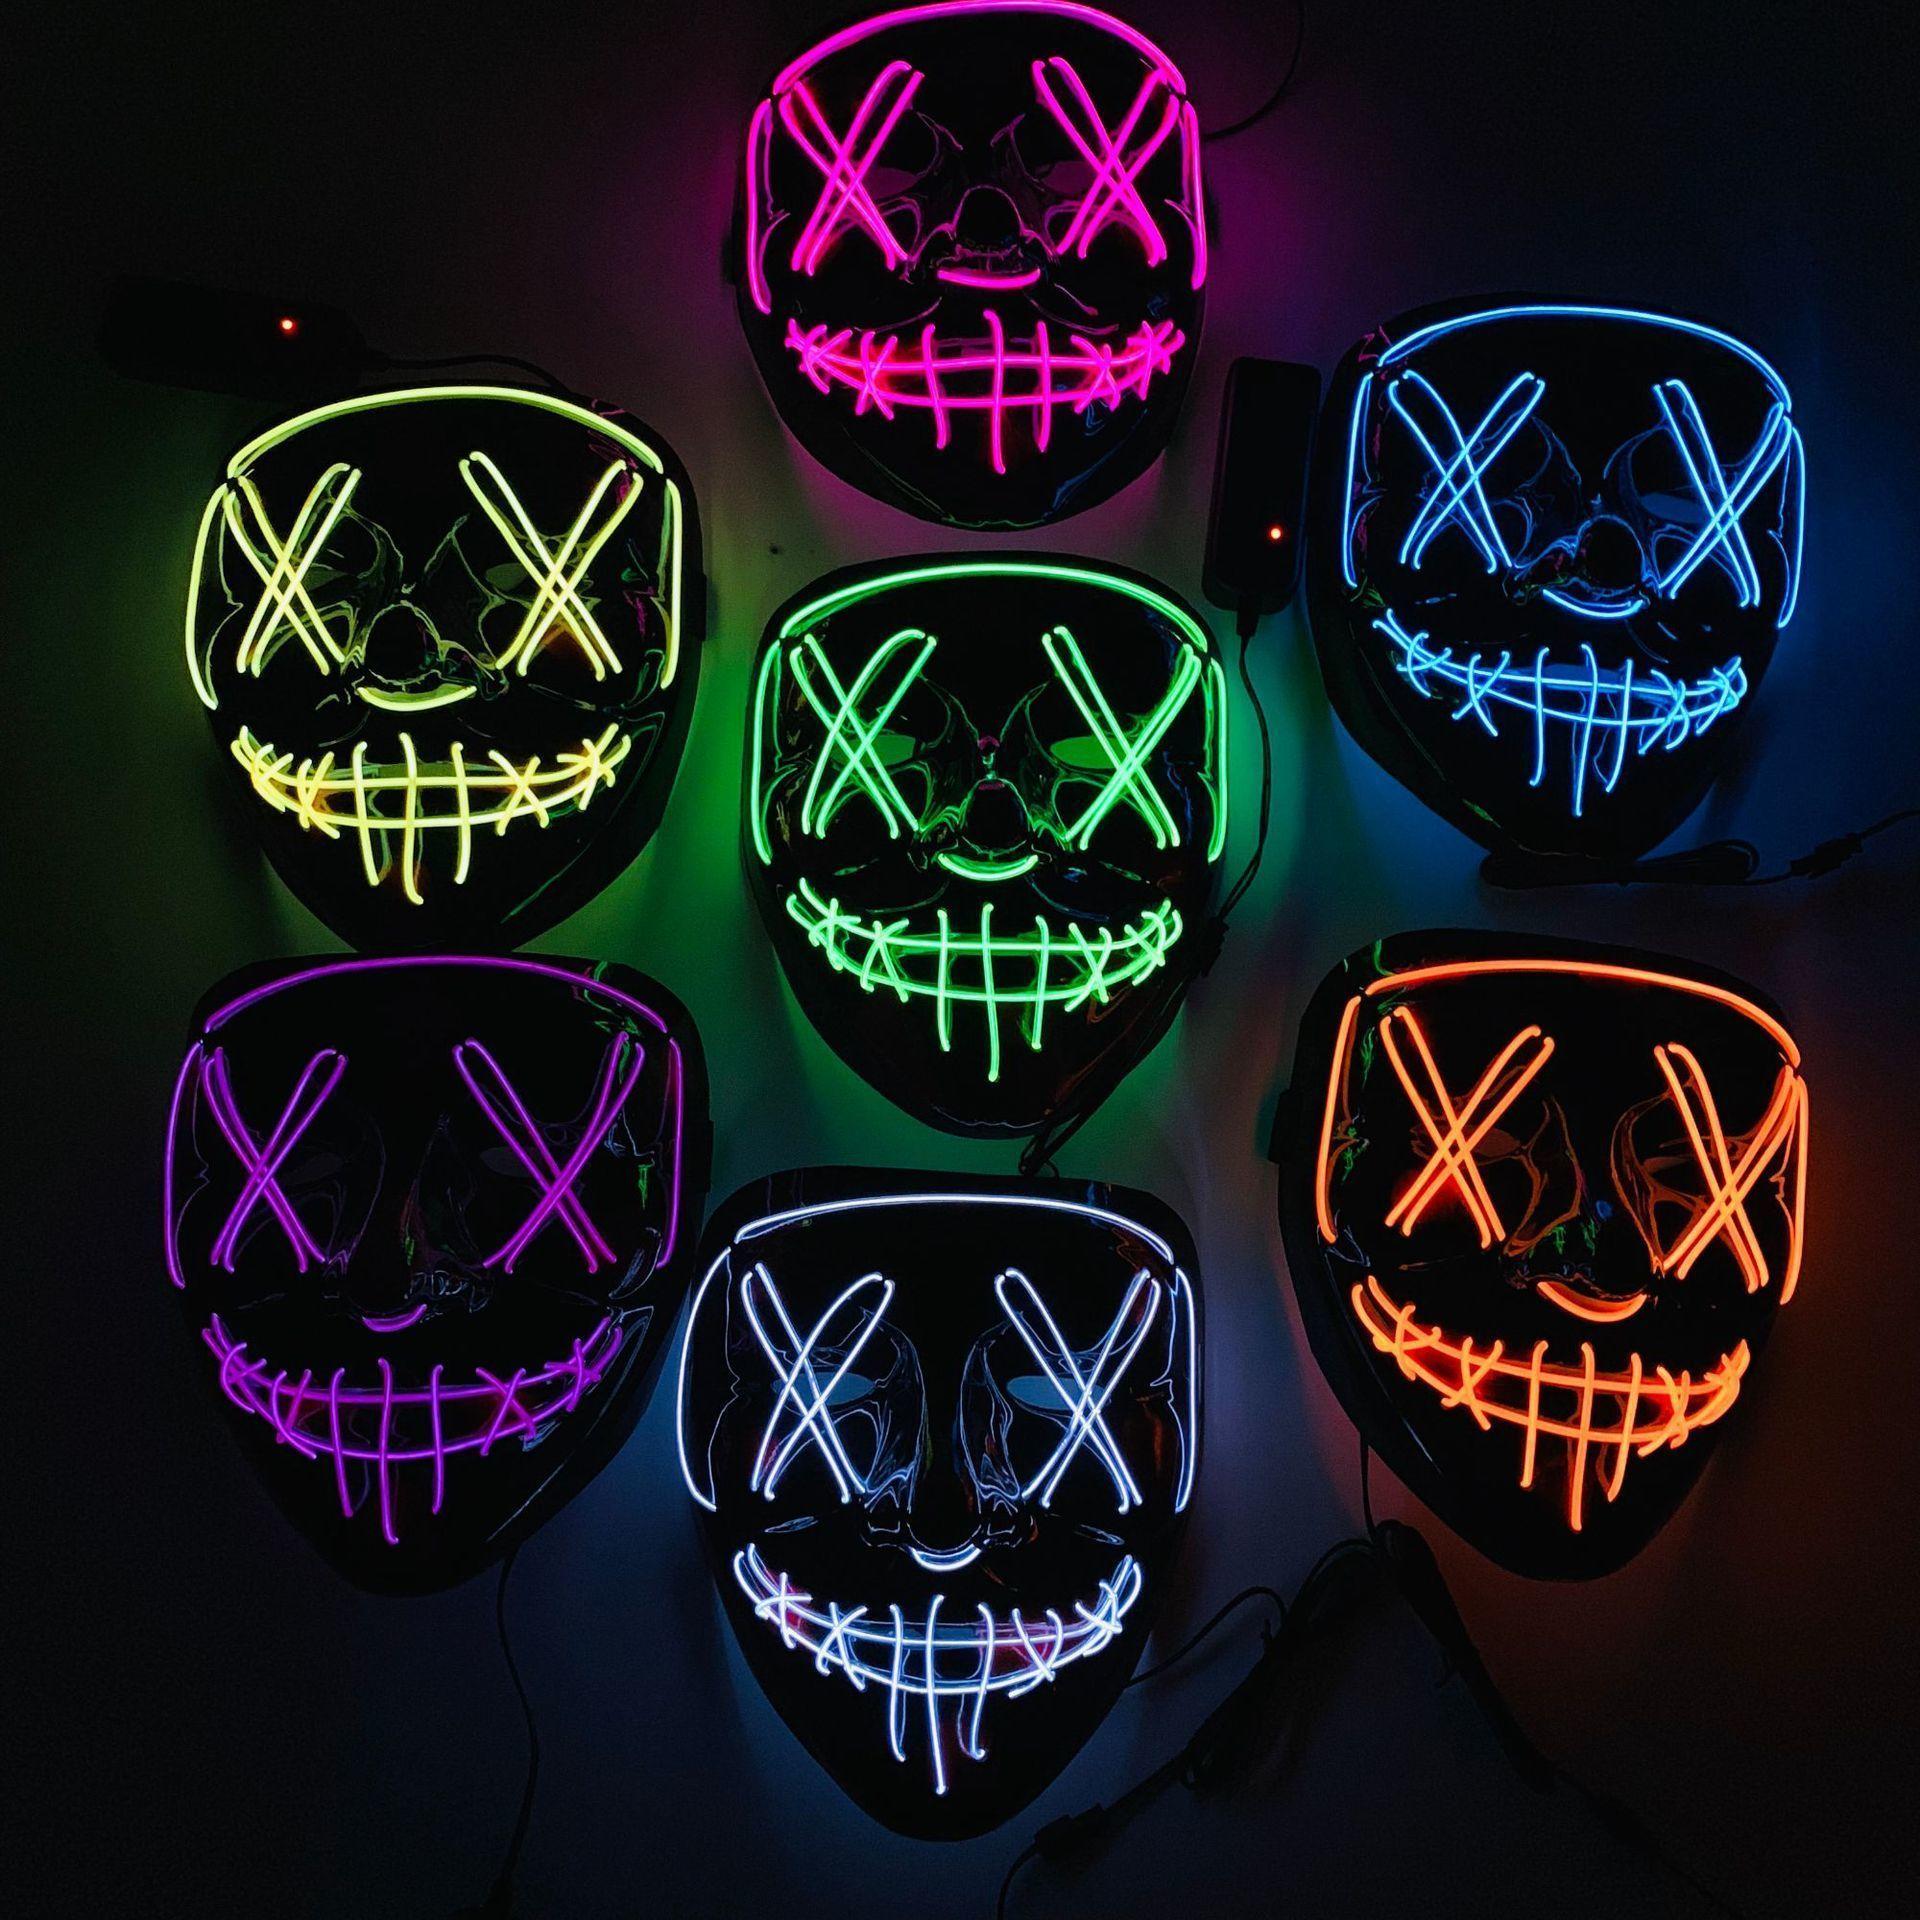 Halloween Mask LED Light Up Party Masks Neon  Cosplay Mascara Horror Glow In Dark Masque V for Vendetta